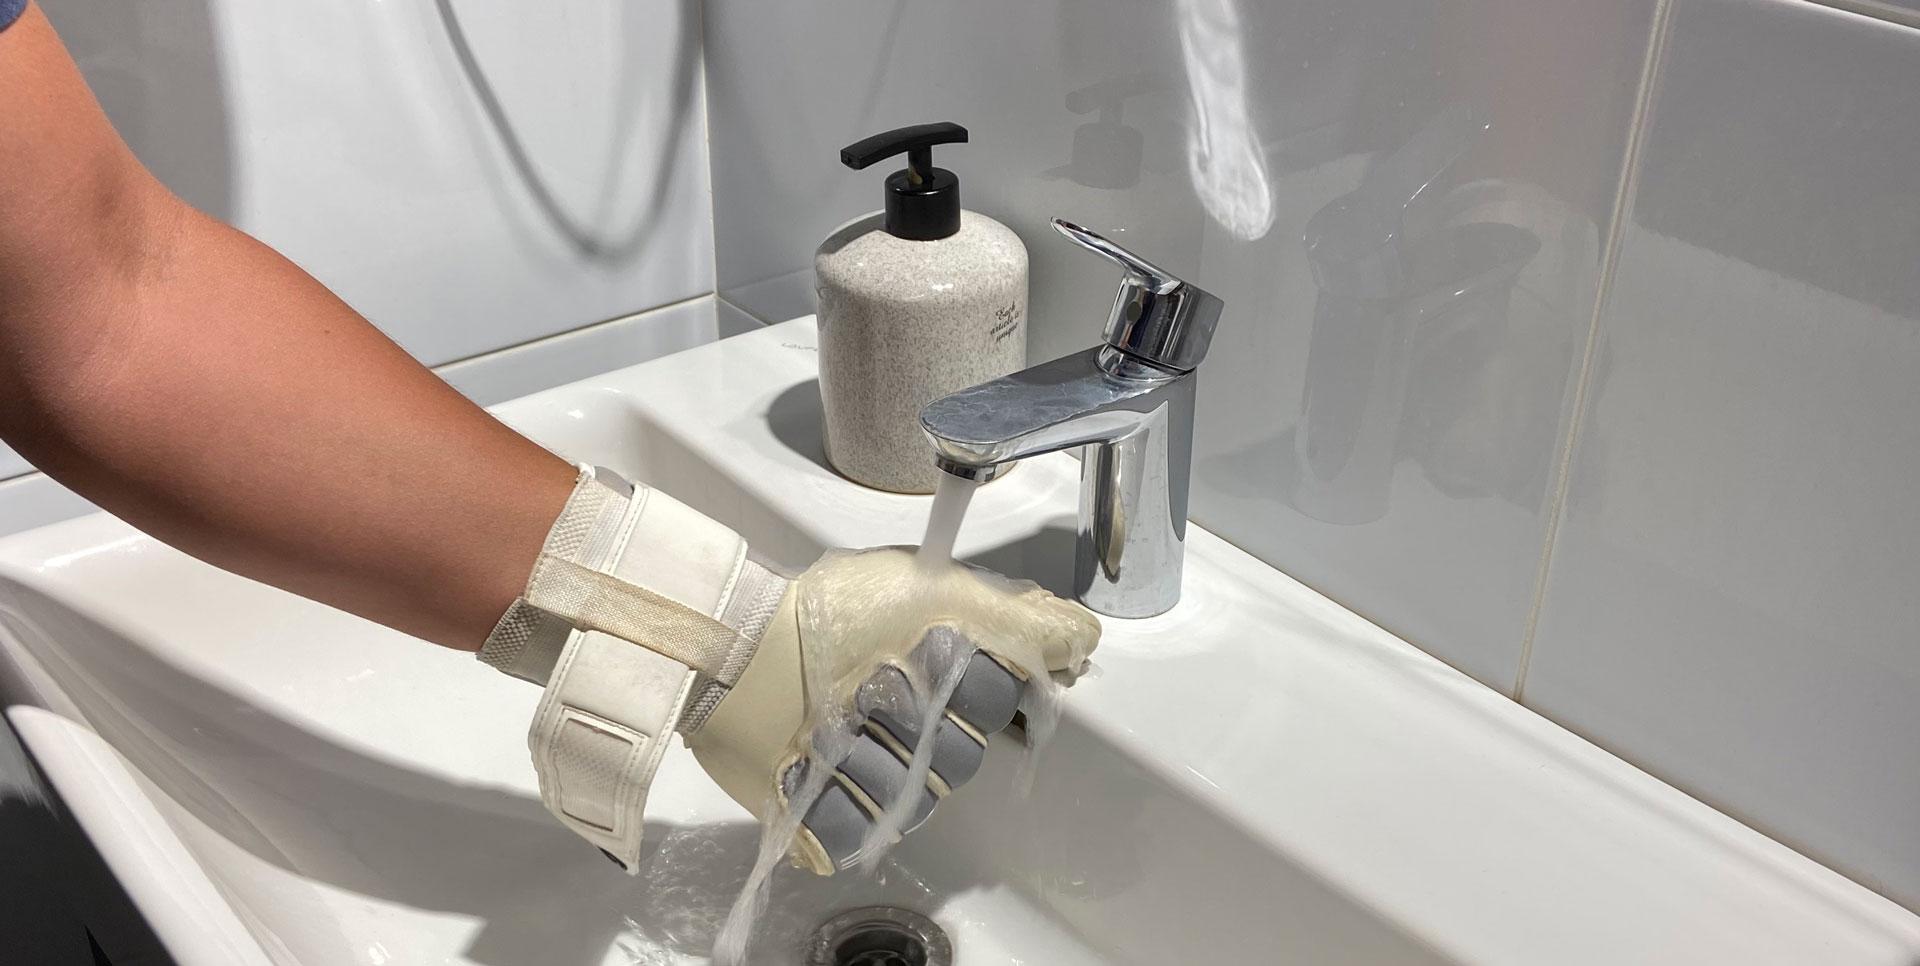 Brave GK Catalyst Grey means for protection of goalkeeper gloves online store Brave GK